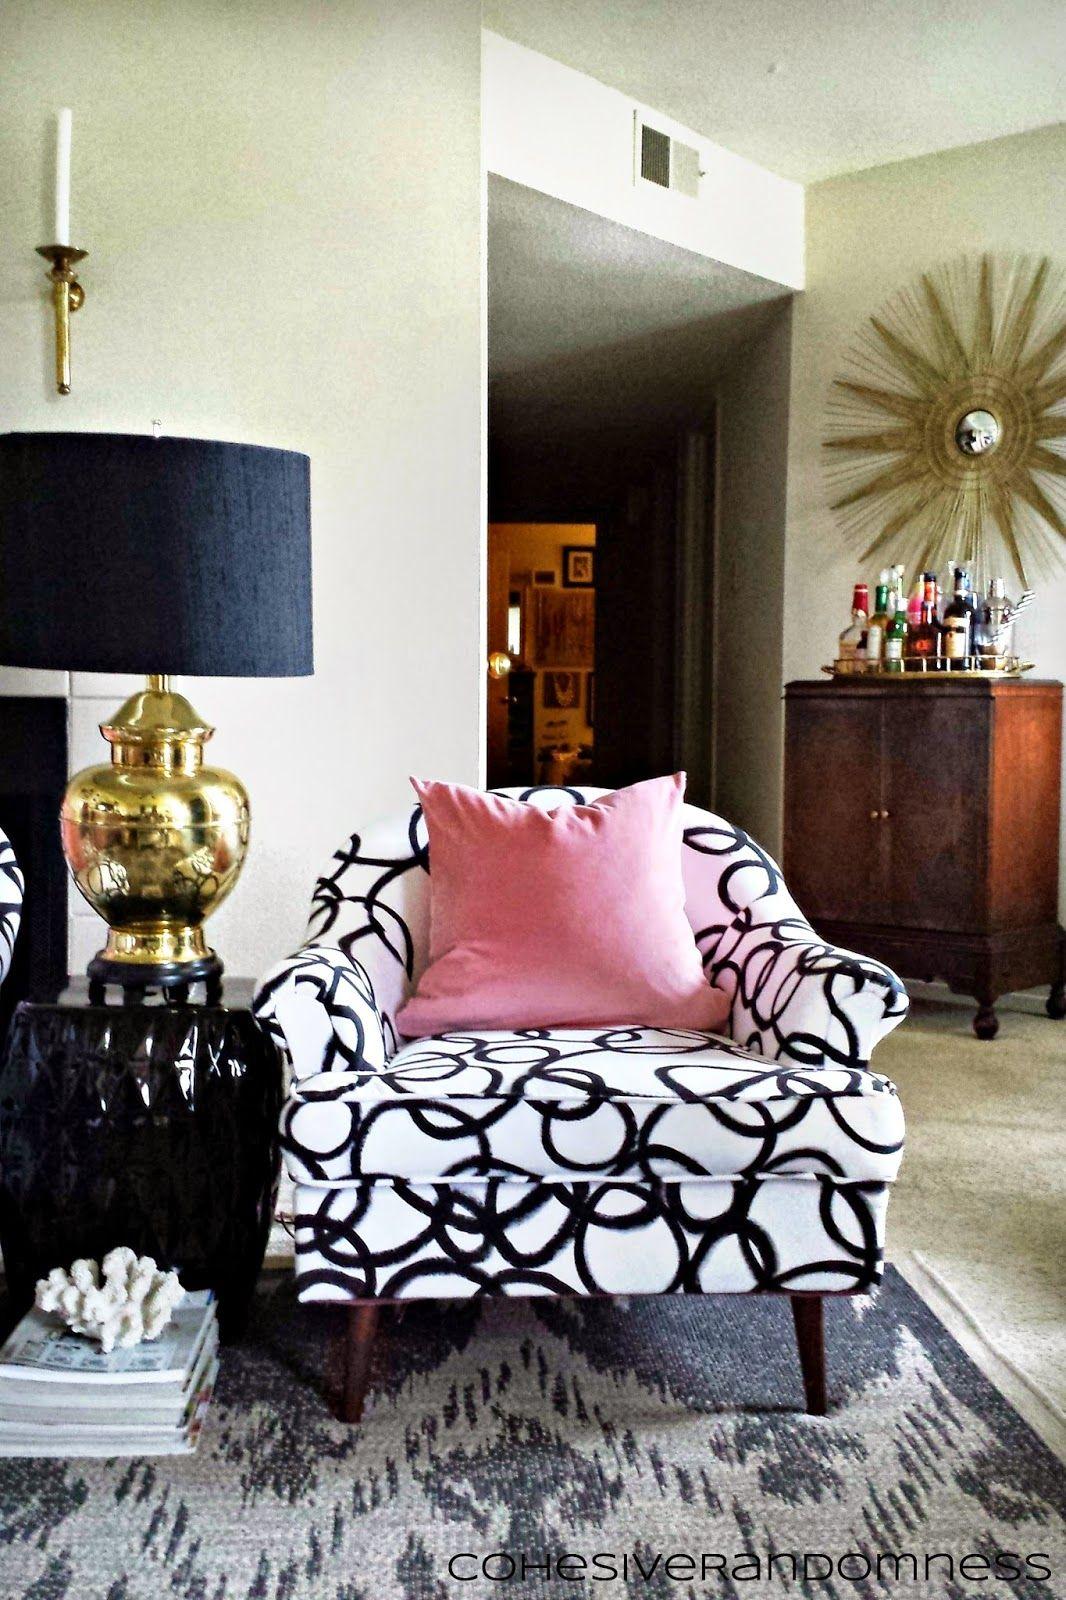 cohesiverandomness living room diy painted fabric painted chairs rh pinterest com